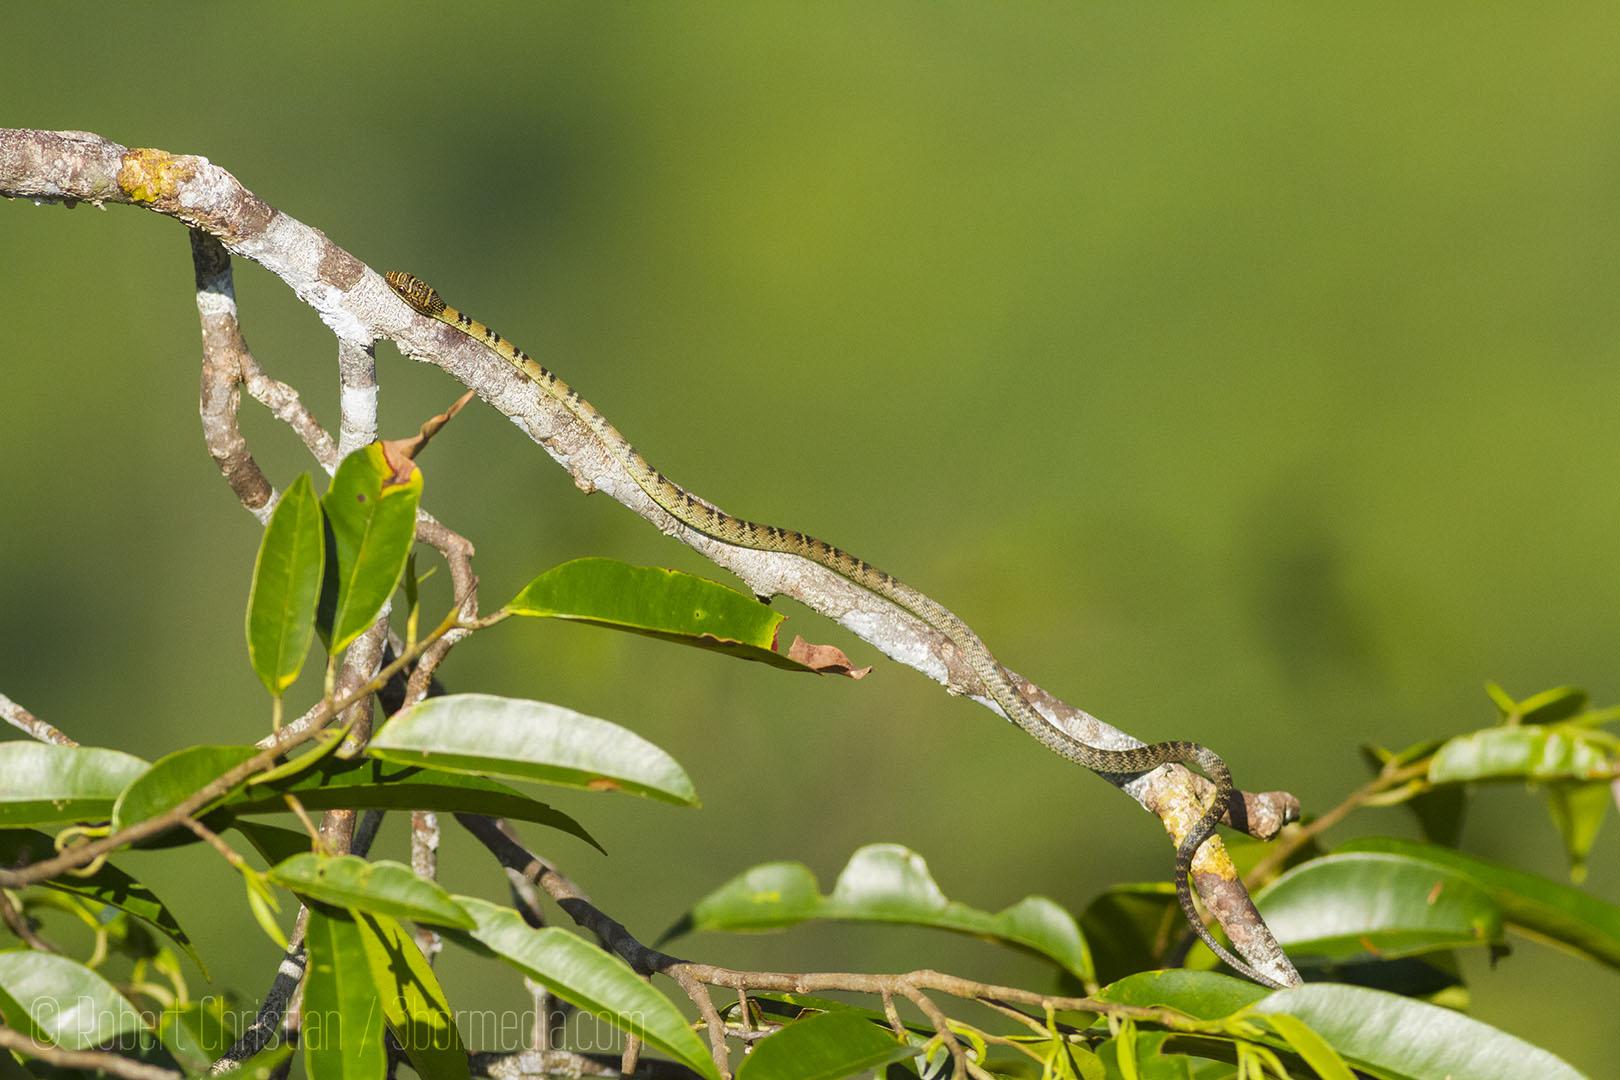 Twin Barred Tree Snake.